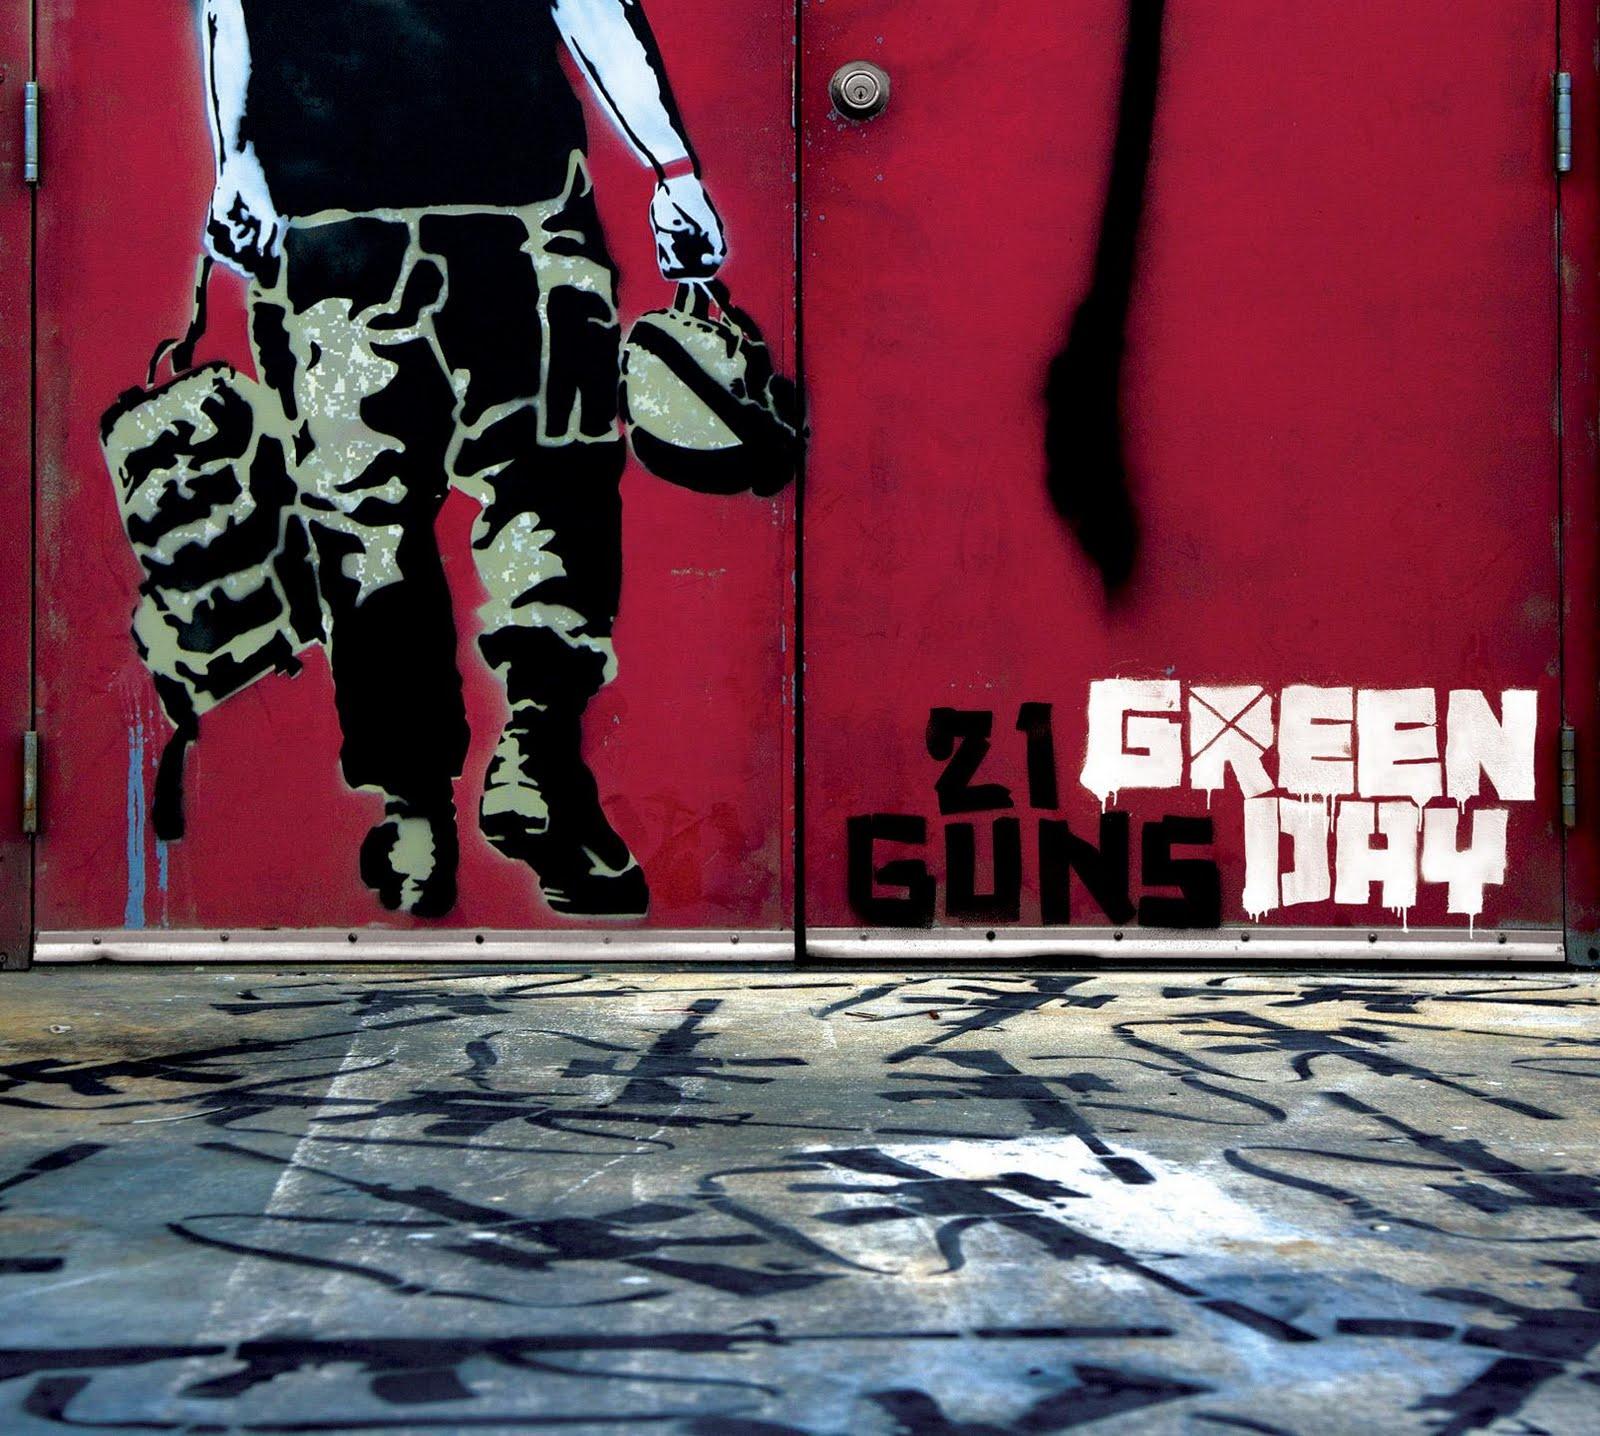 21 Guns Chords Greenday 21 Guns Guitar Chords Tabs Lyrics Song Facts Meaning